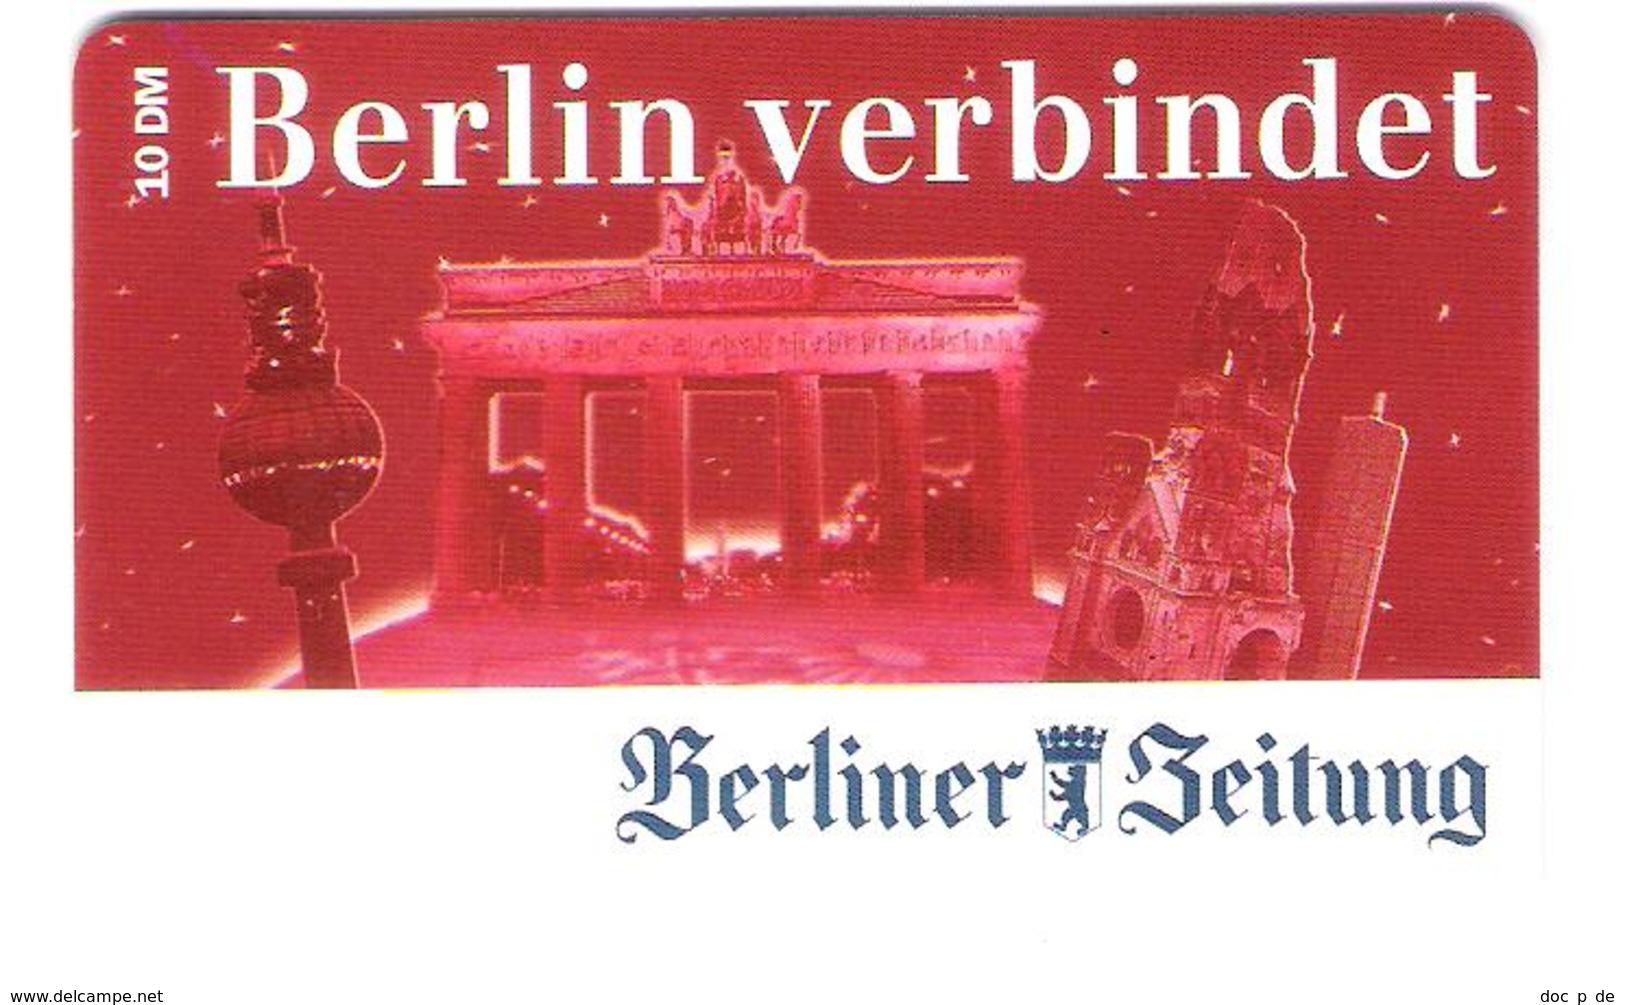 Germany - Prepaid - ABCom - Berliner Zeitung - Newspaper - Berlin - Fernsehturm - Brandenburger Tor - Ex. Date 08/2001 - Germany